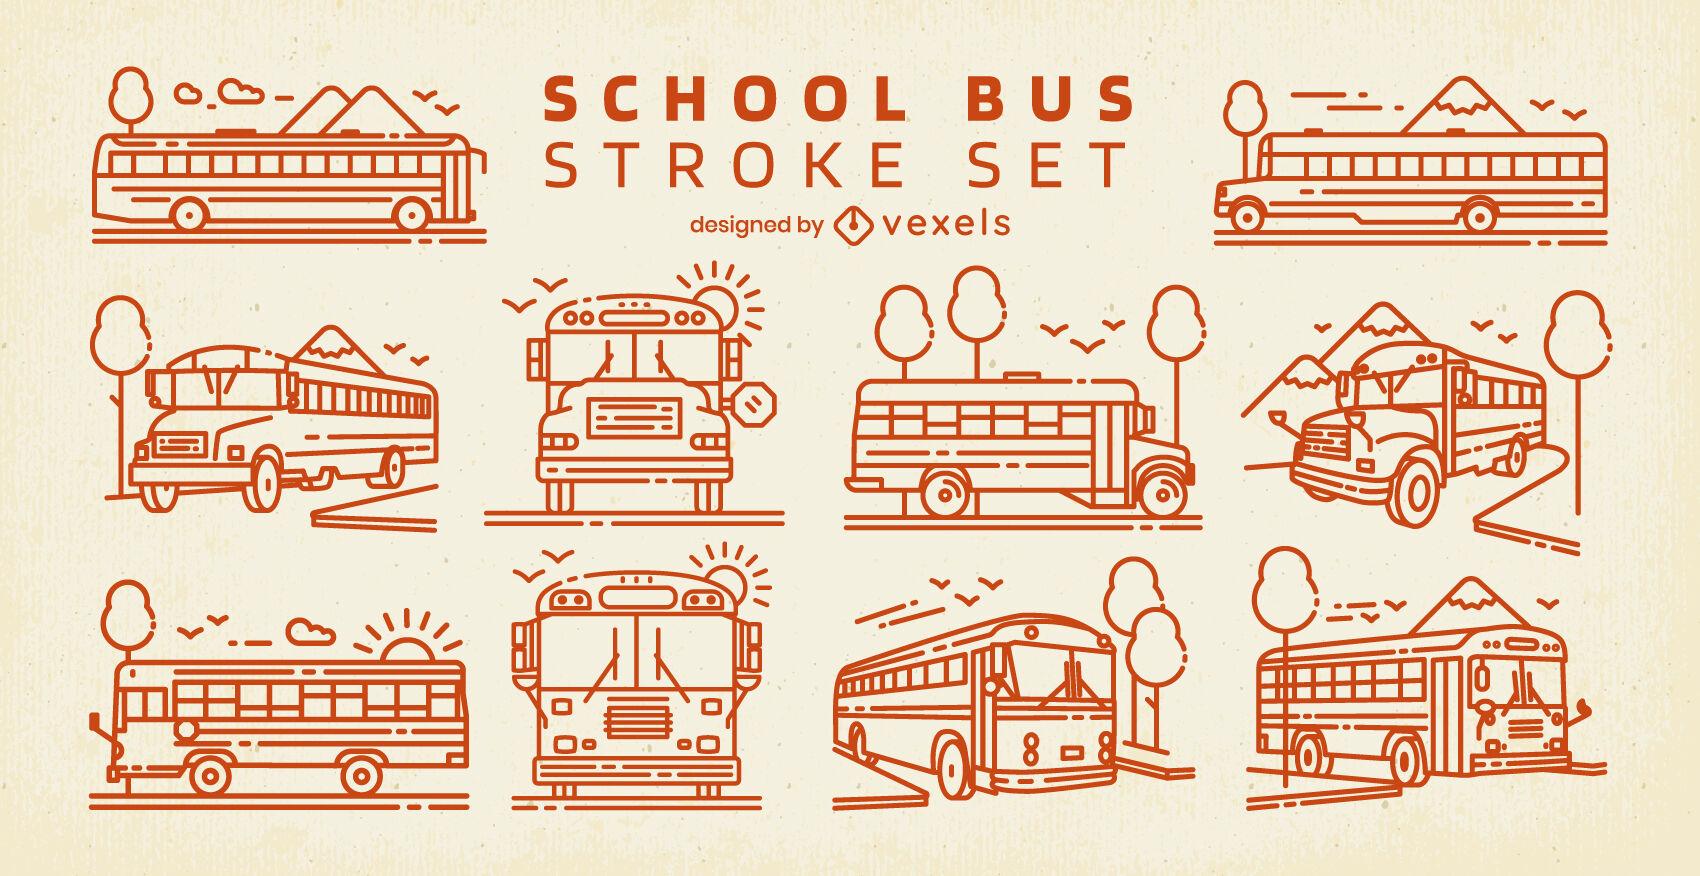 School buses stroke set